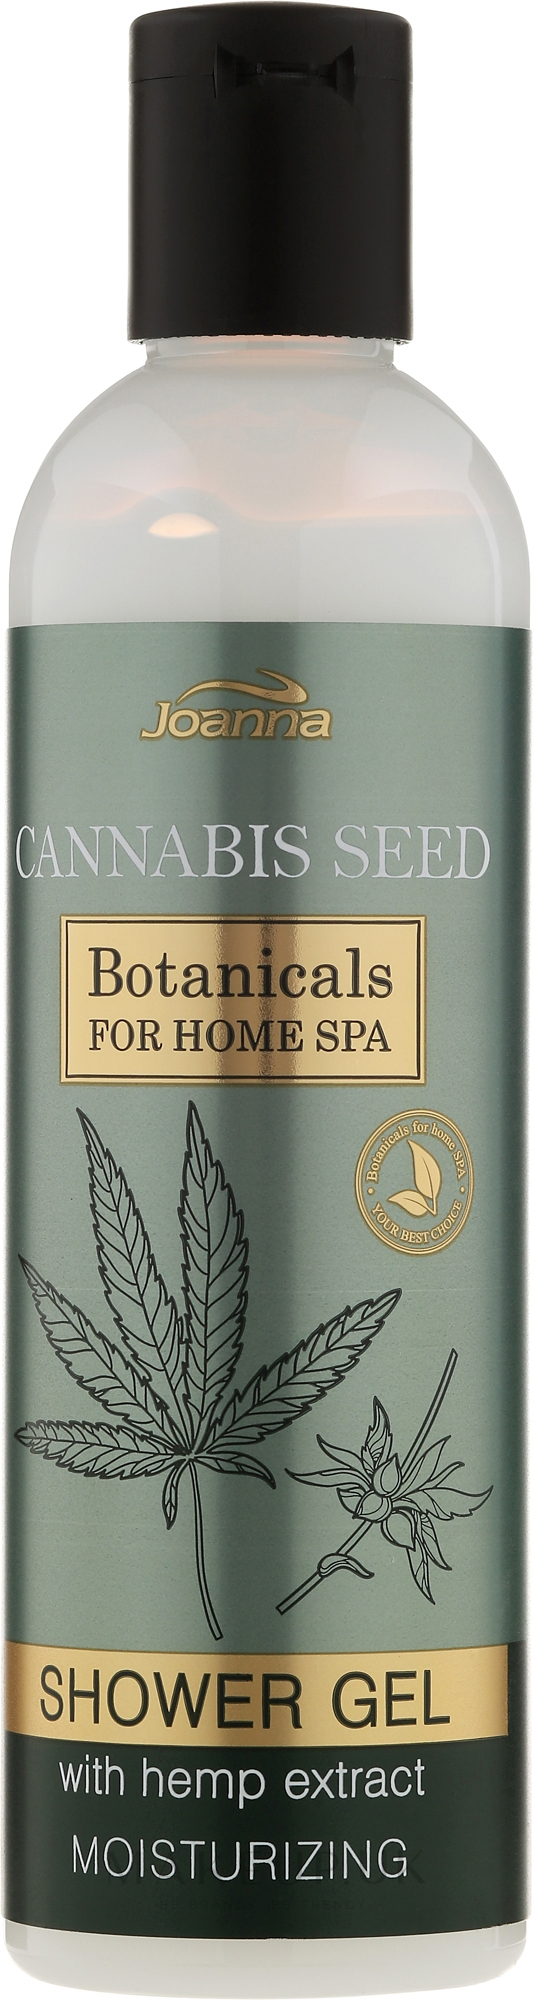 Moisturizing Shower Gel - Joanna Botanicals For Home Spa Cannabis Seed Shower Gel — photo 240 ml